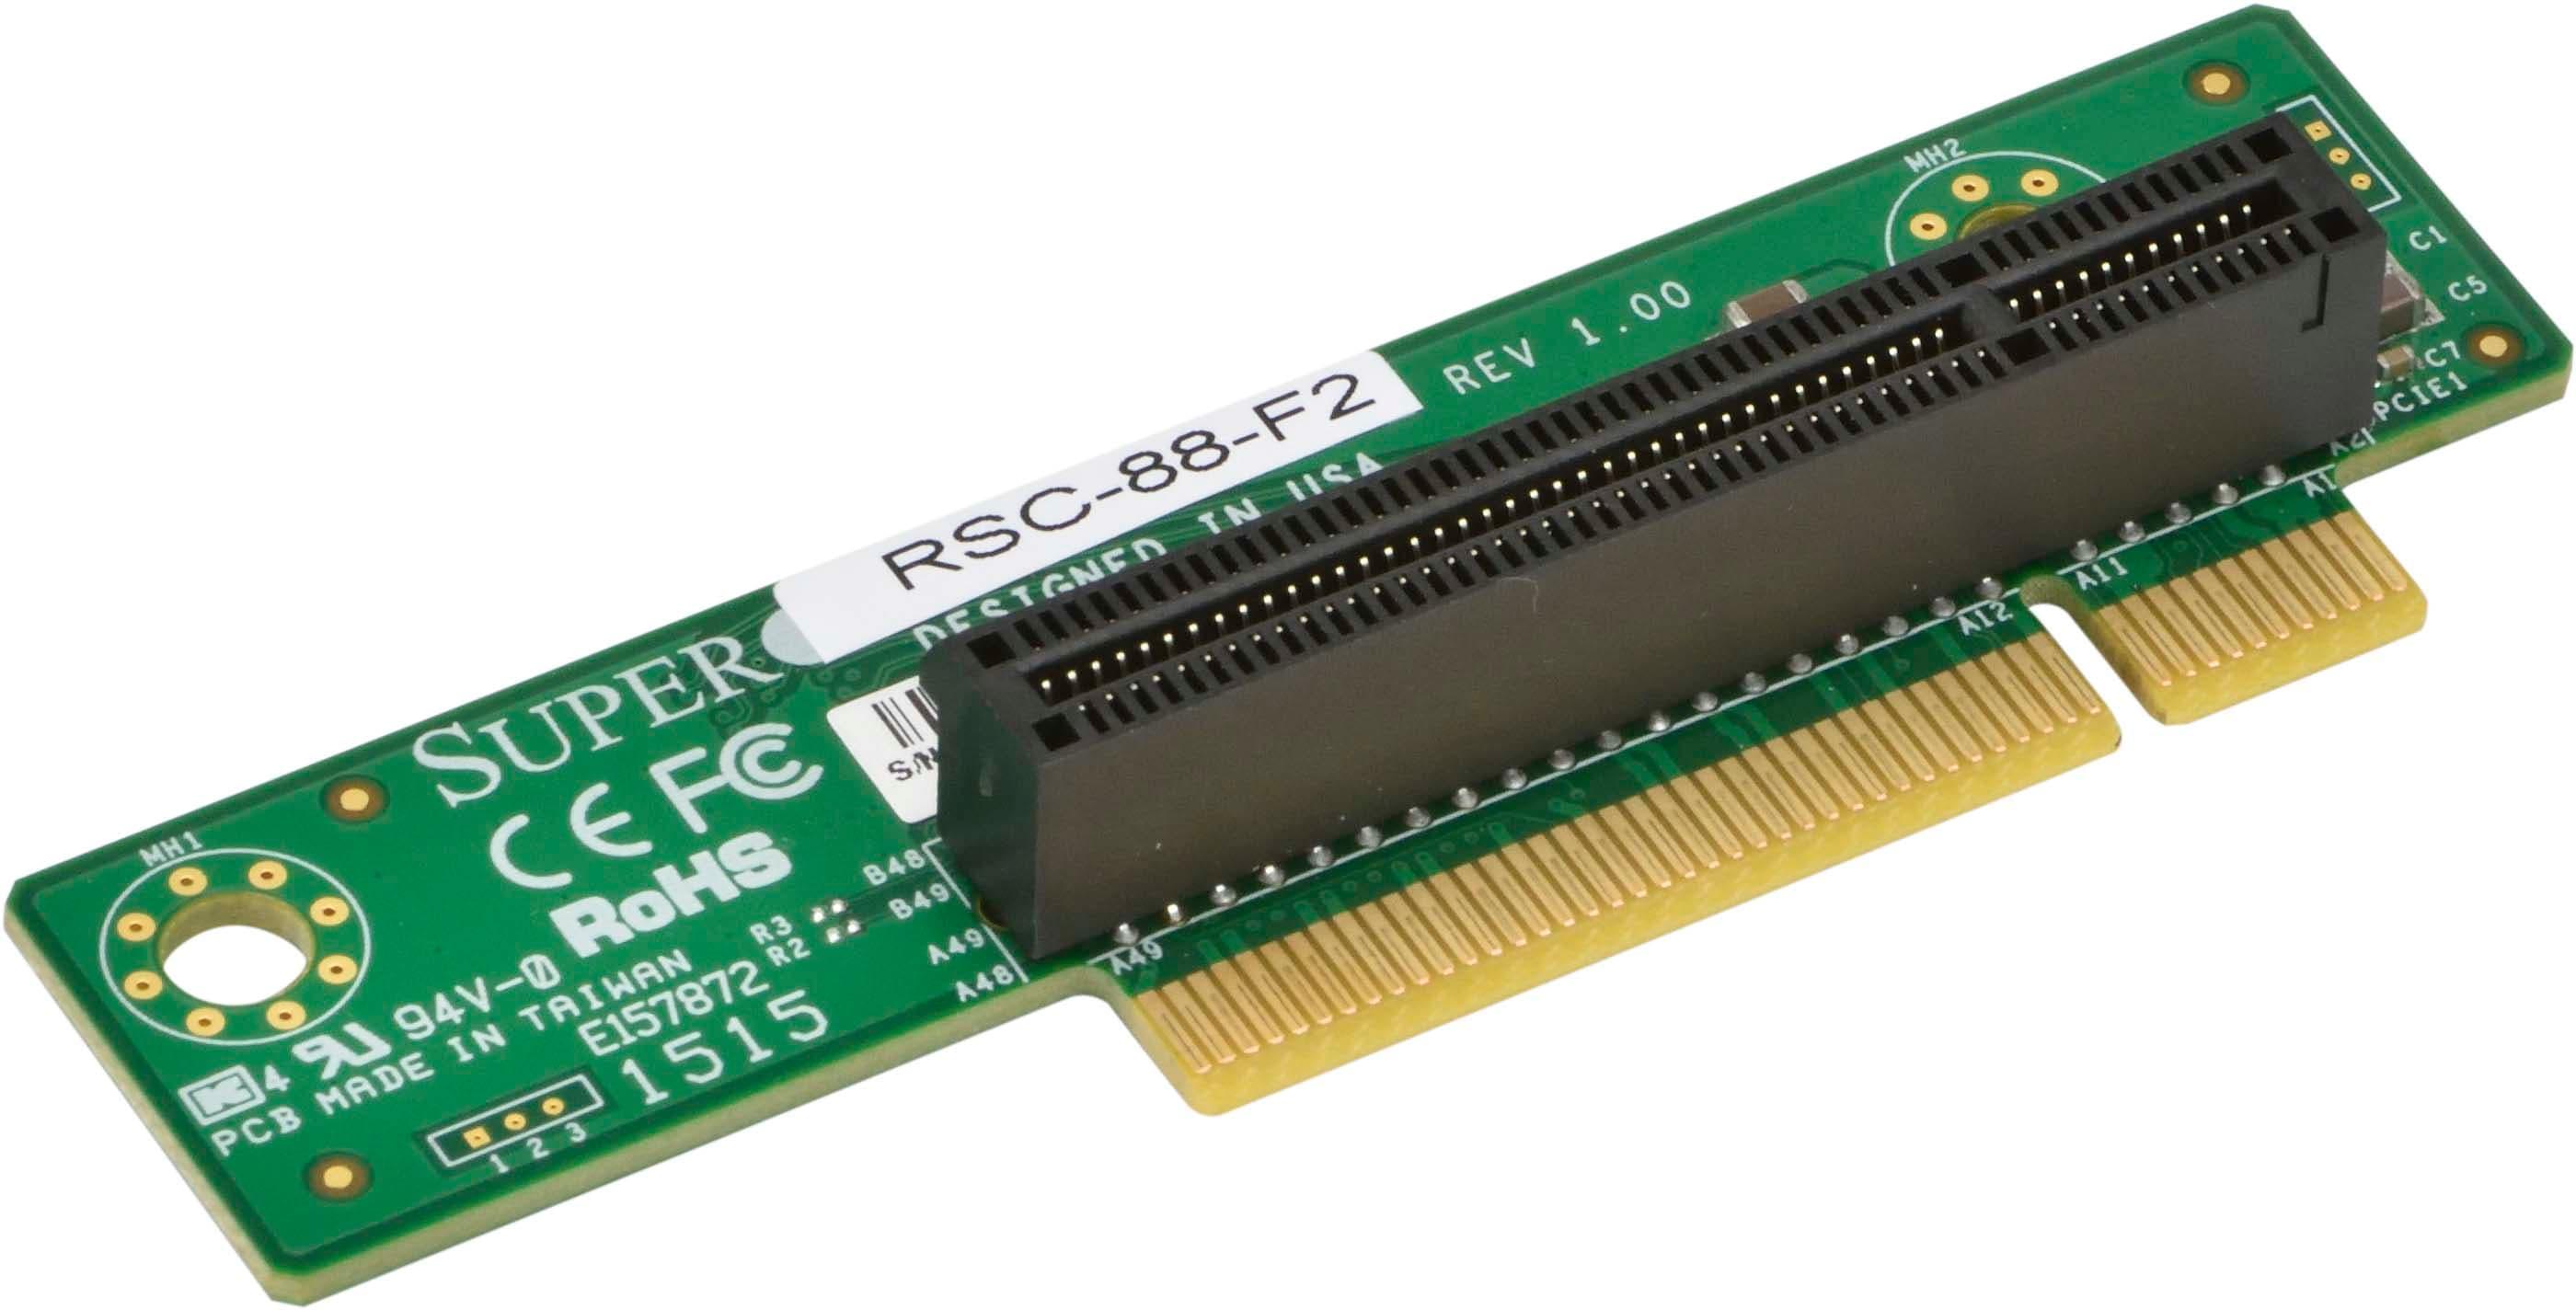 Zdjecie - RSC-88-F2 - Supermicro